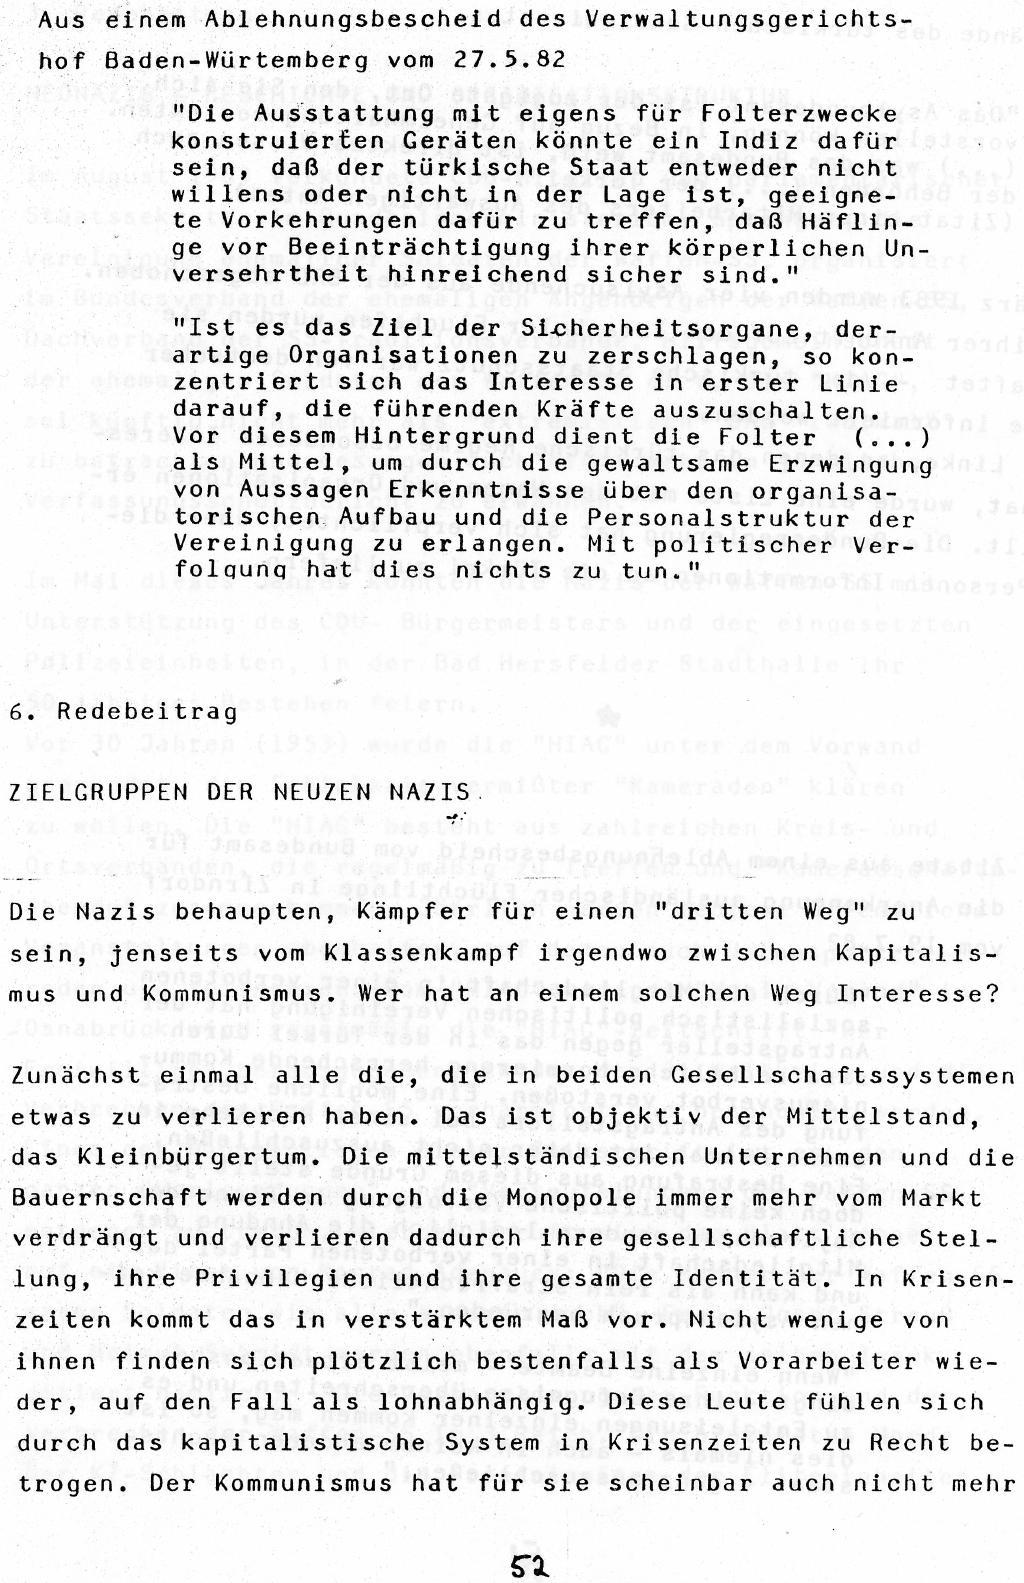 Berlin_1983_Autonome_Gruppen_Faschismus_im_Kapitalismus_52